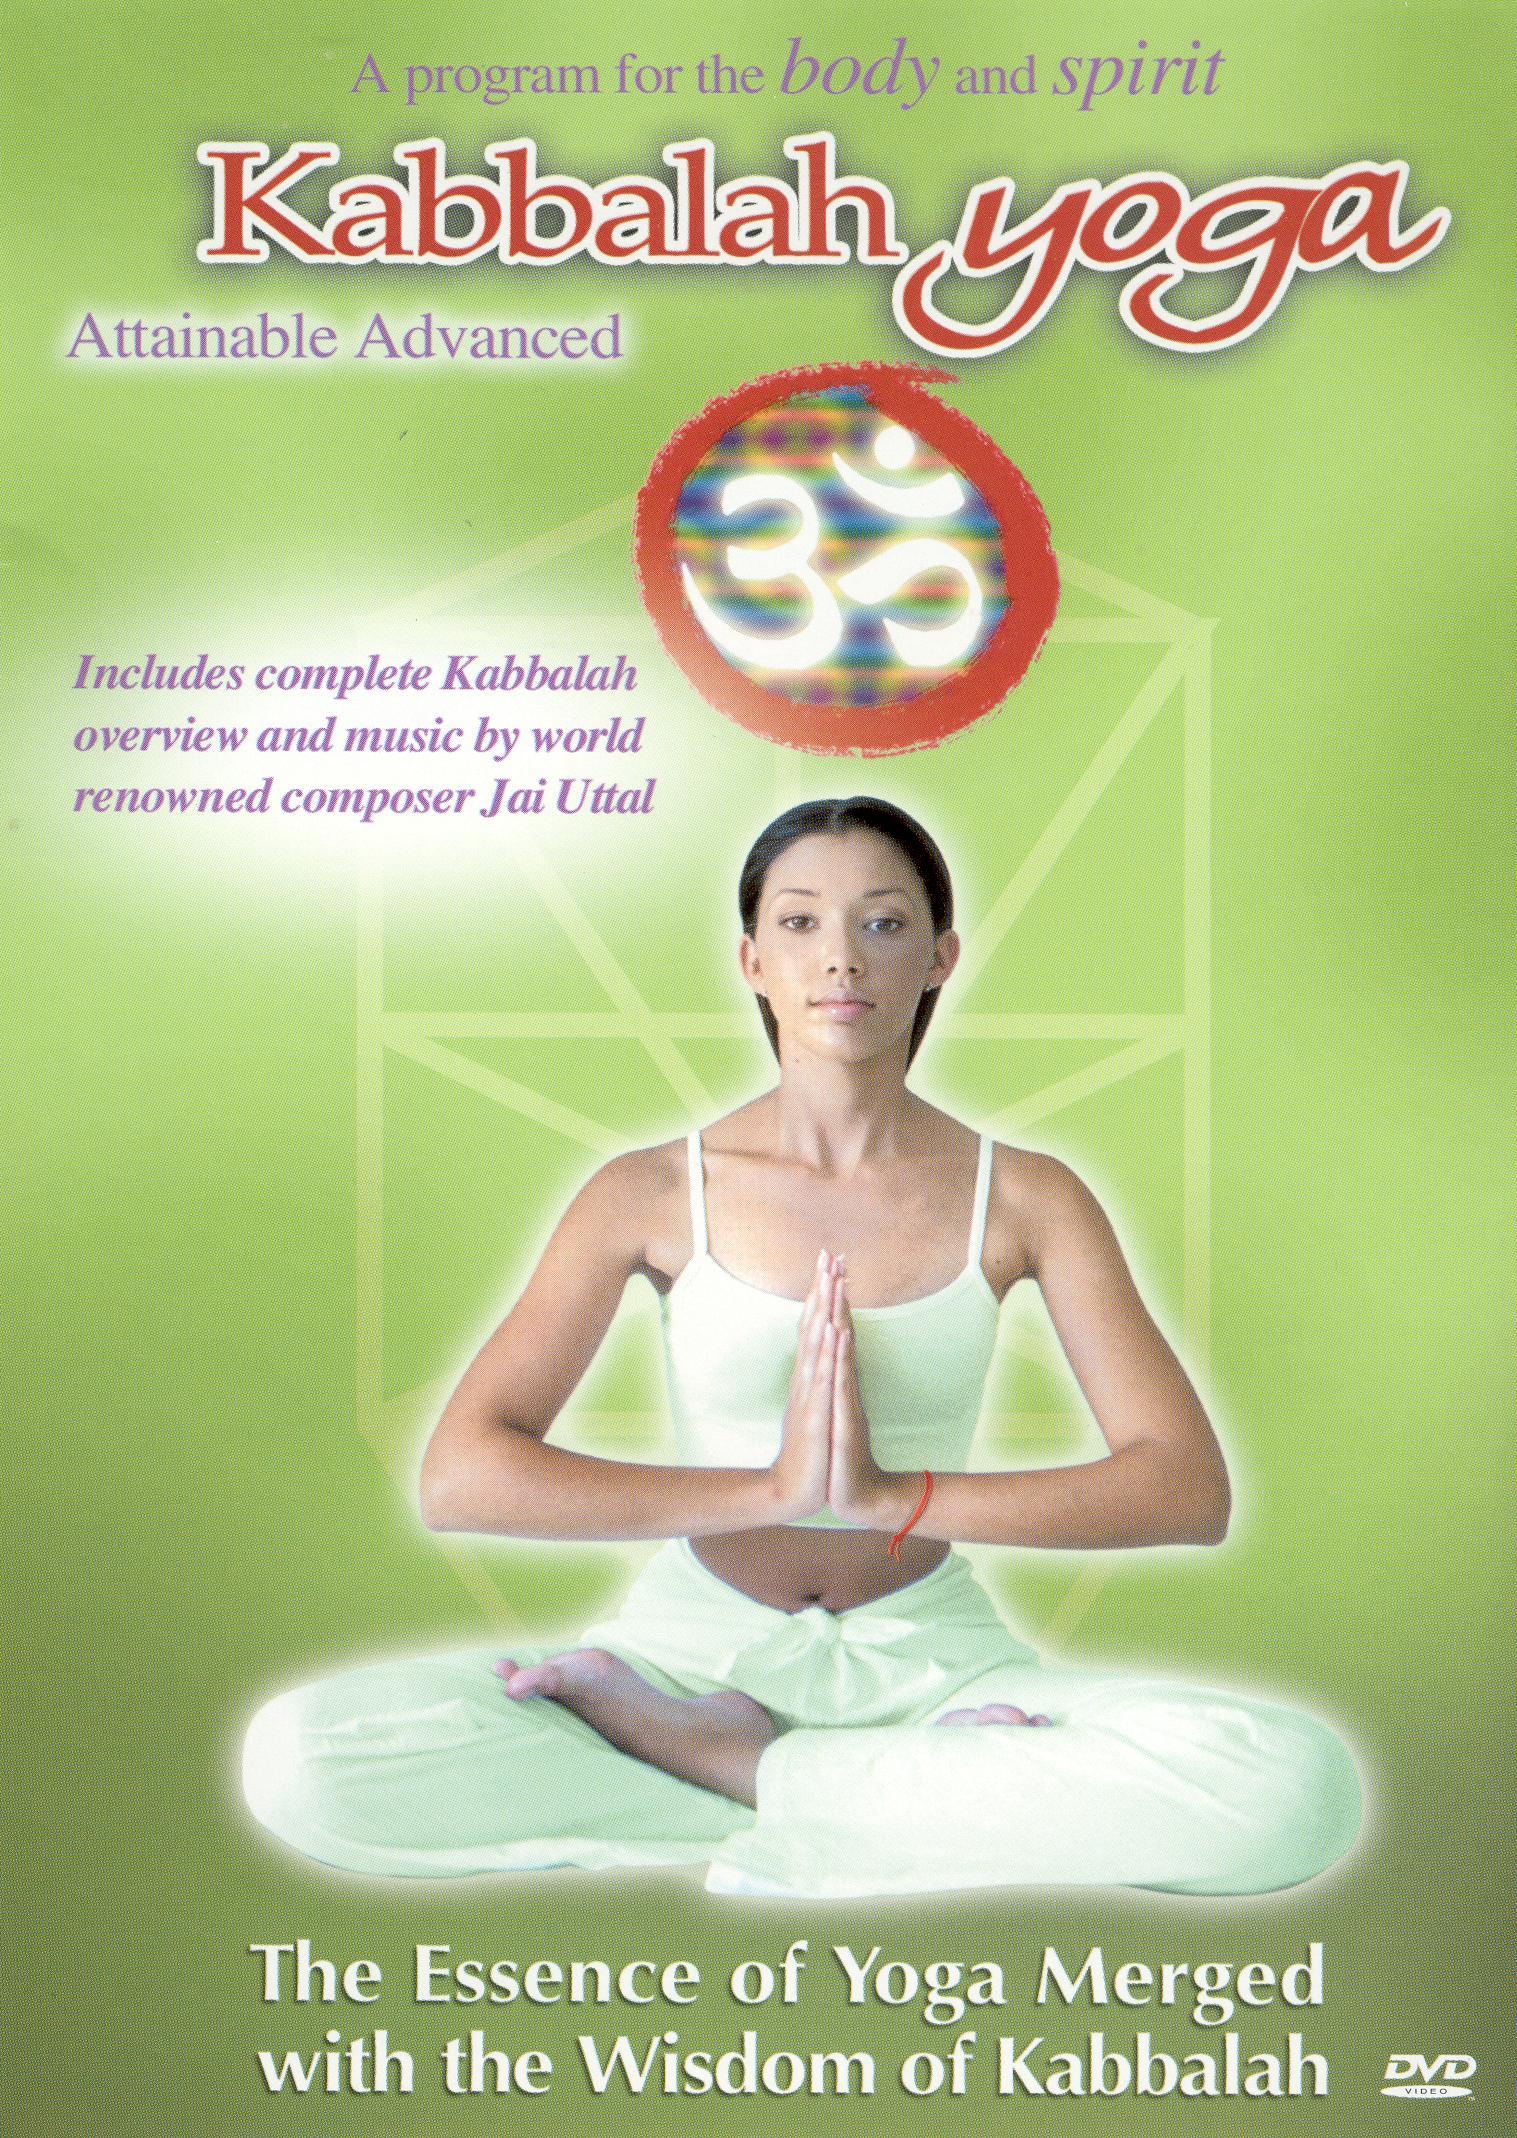 Kabbalah Yoga: Attainable Advanced